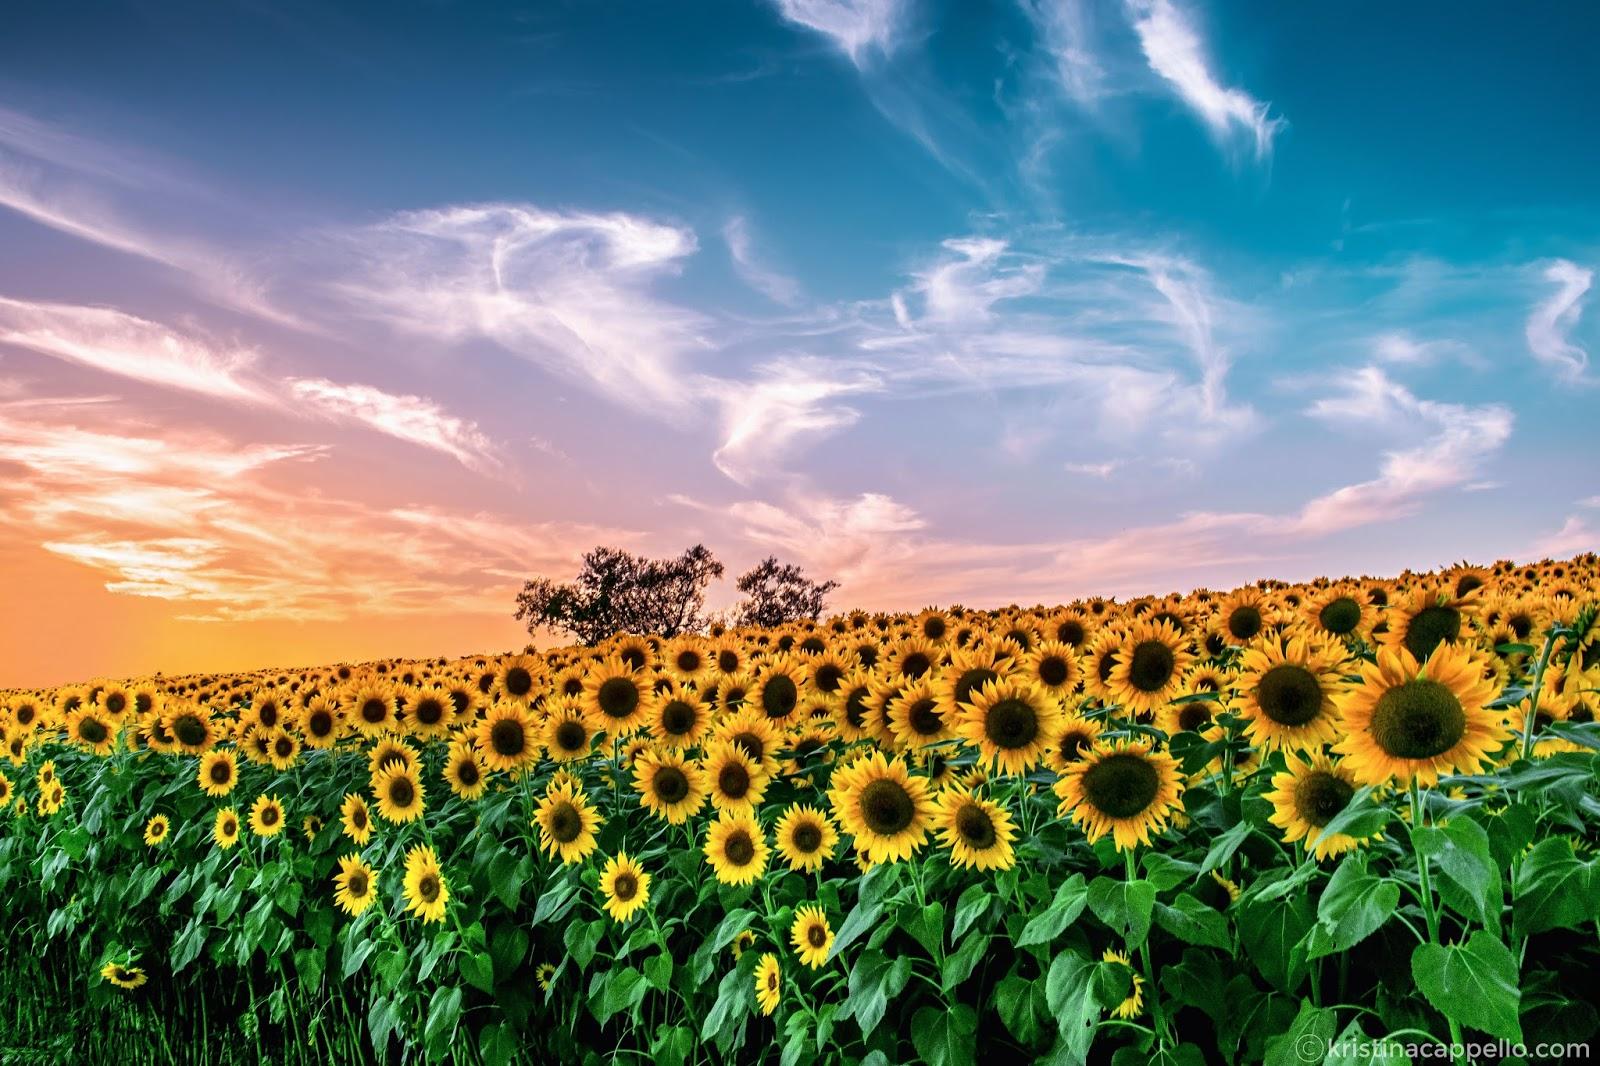 sunflower fields 2 by - photo #16